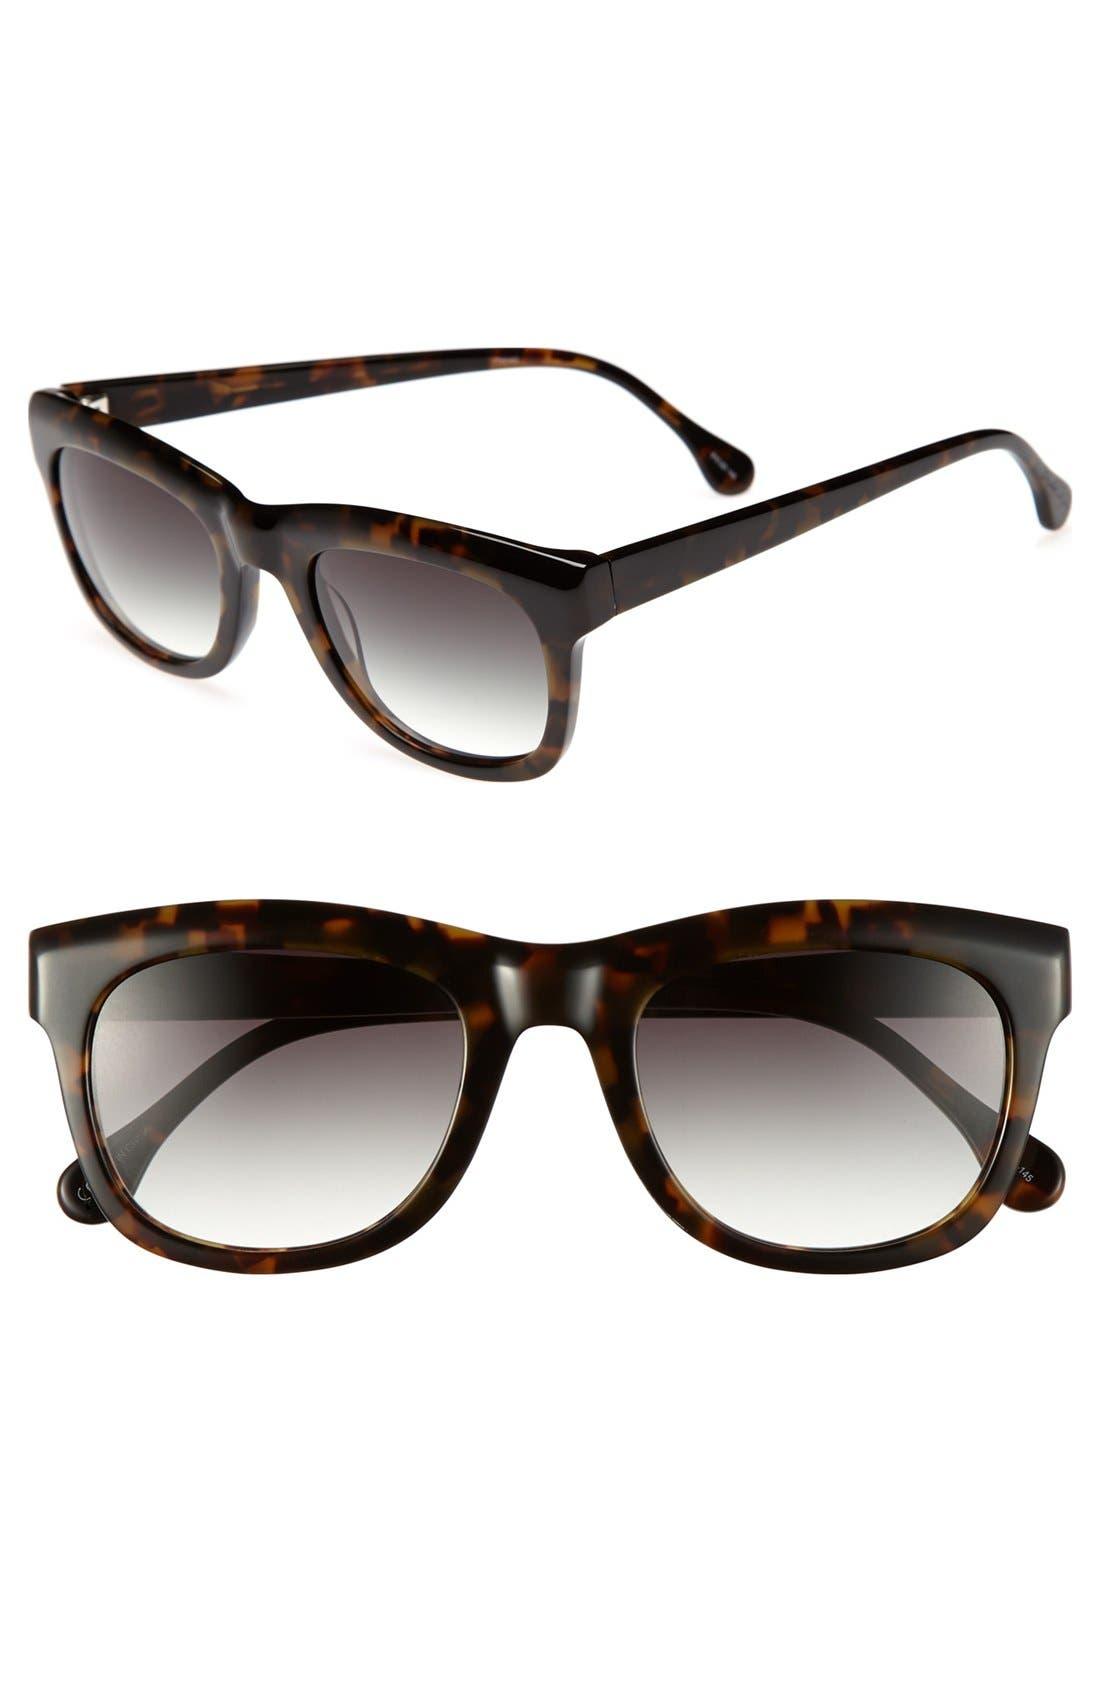 Main Image - Elizabeth and James 'Harrington' 51mm Sunglasses